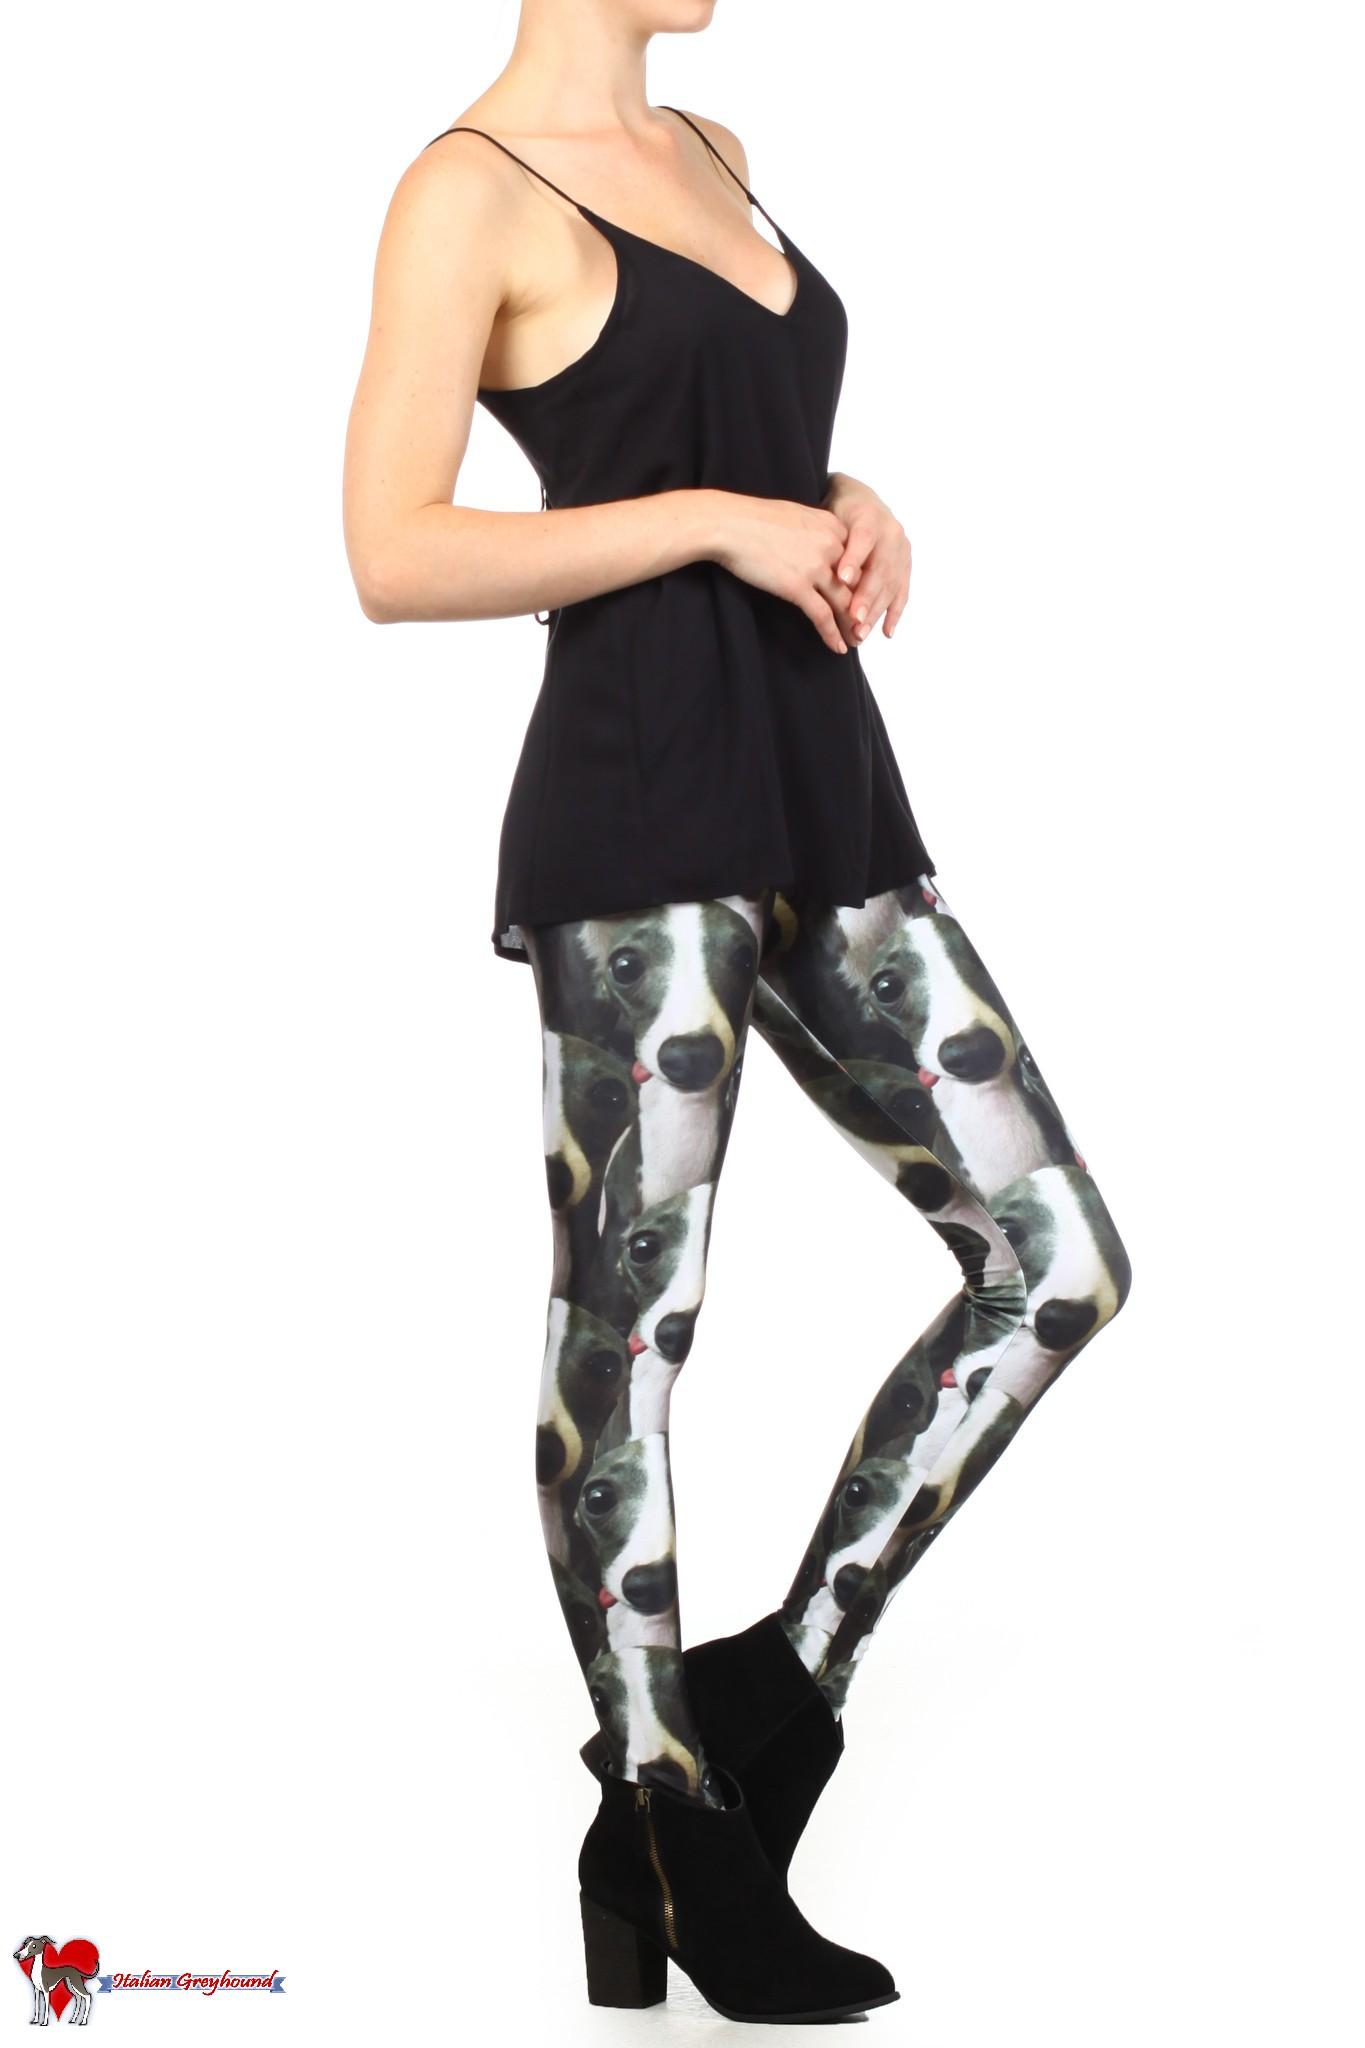 iggy fashion, italian greyhound, fashion, leggings, leggin, pants, greyhound, sighthound, trendy, los angeles, chic